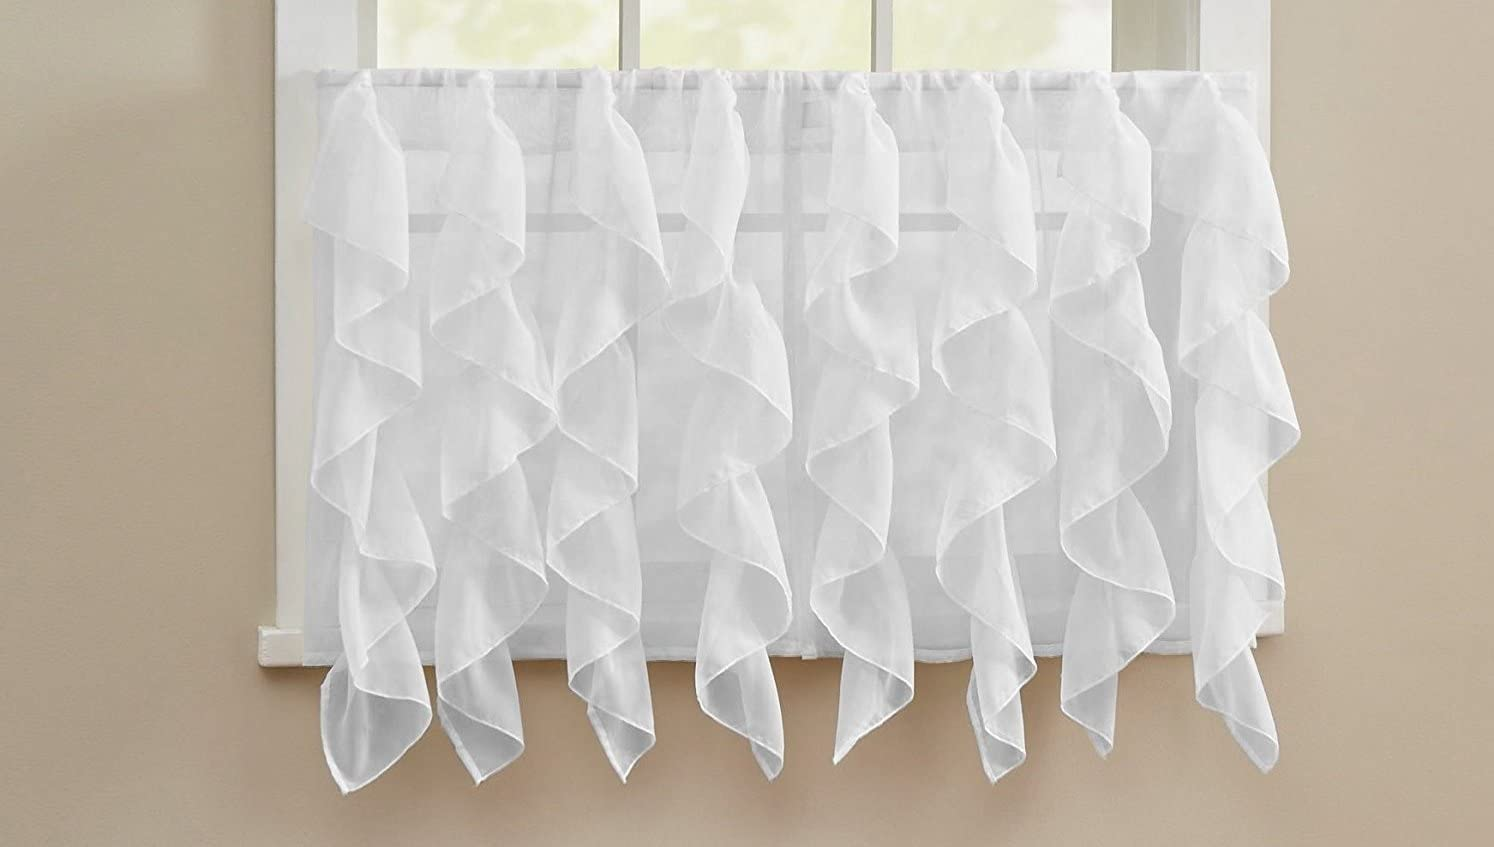 Ben Jonah White Traditional Elegance by Ben Jonah Cascading Waterfall Ruffled Sheer Voile Kitchen Curtain Tier Pair 52 x 36